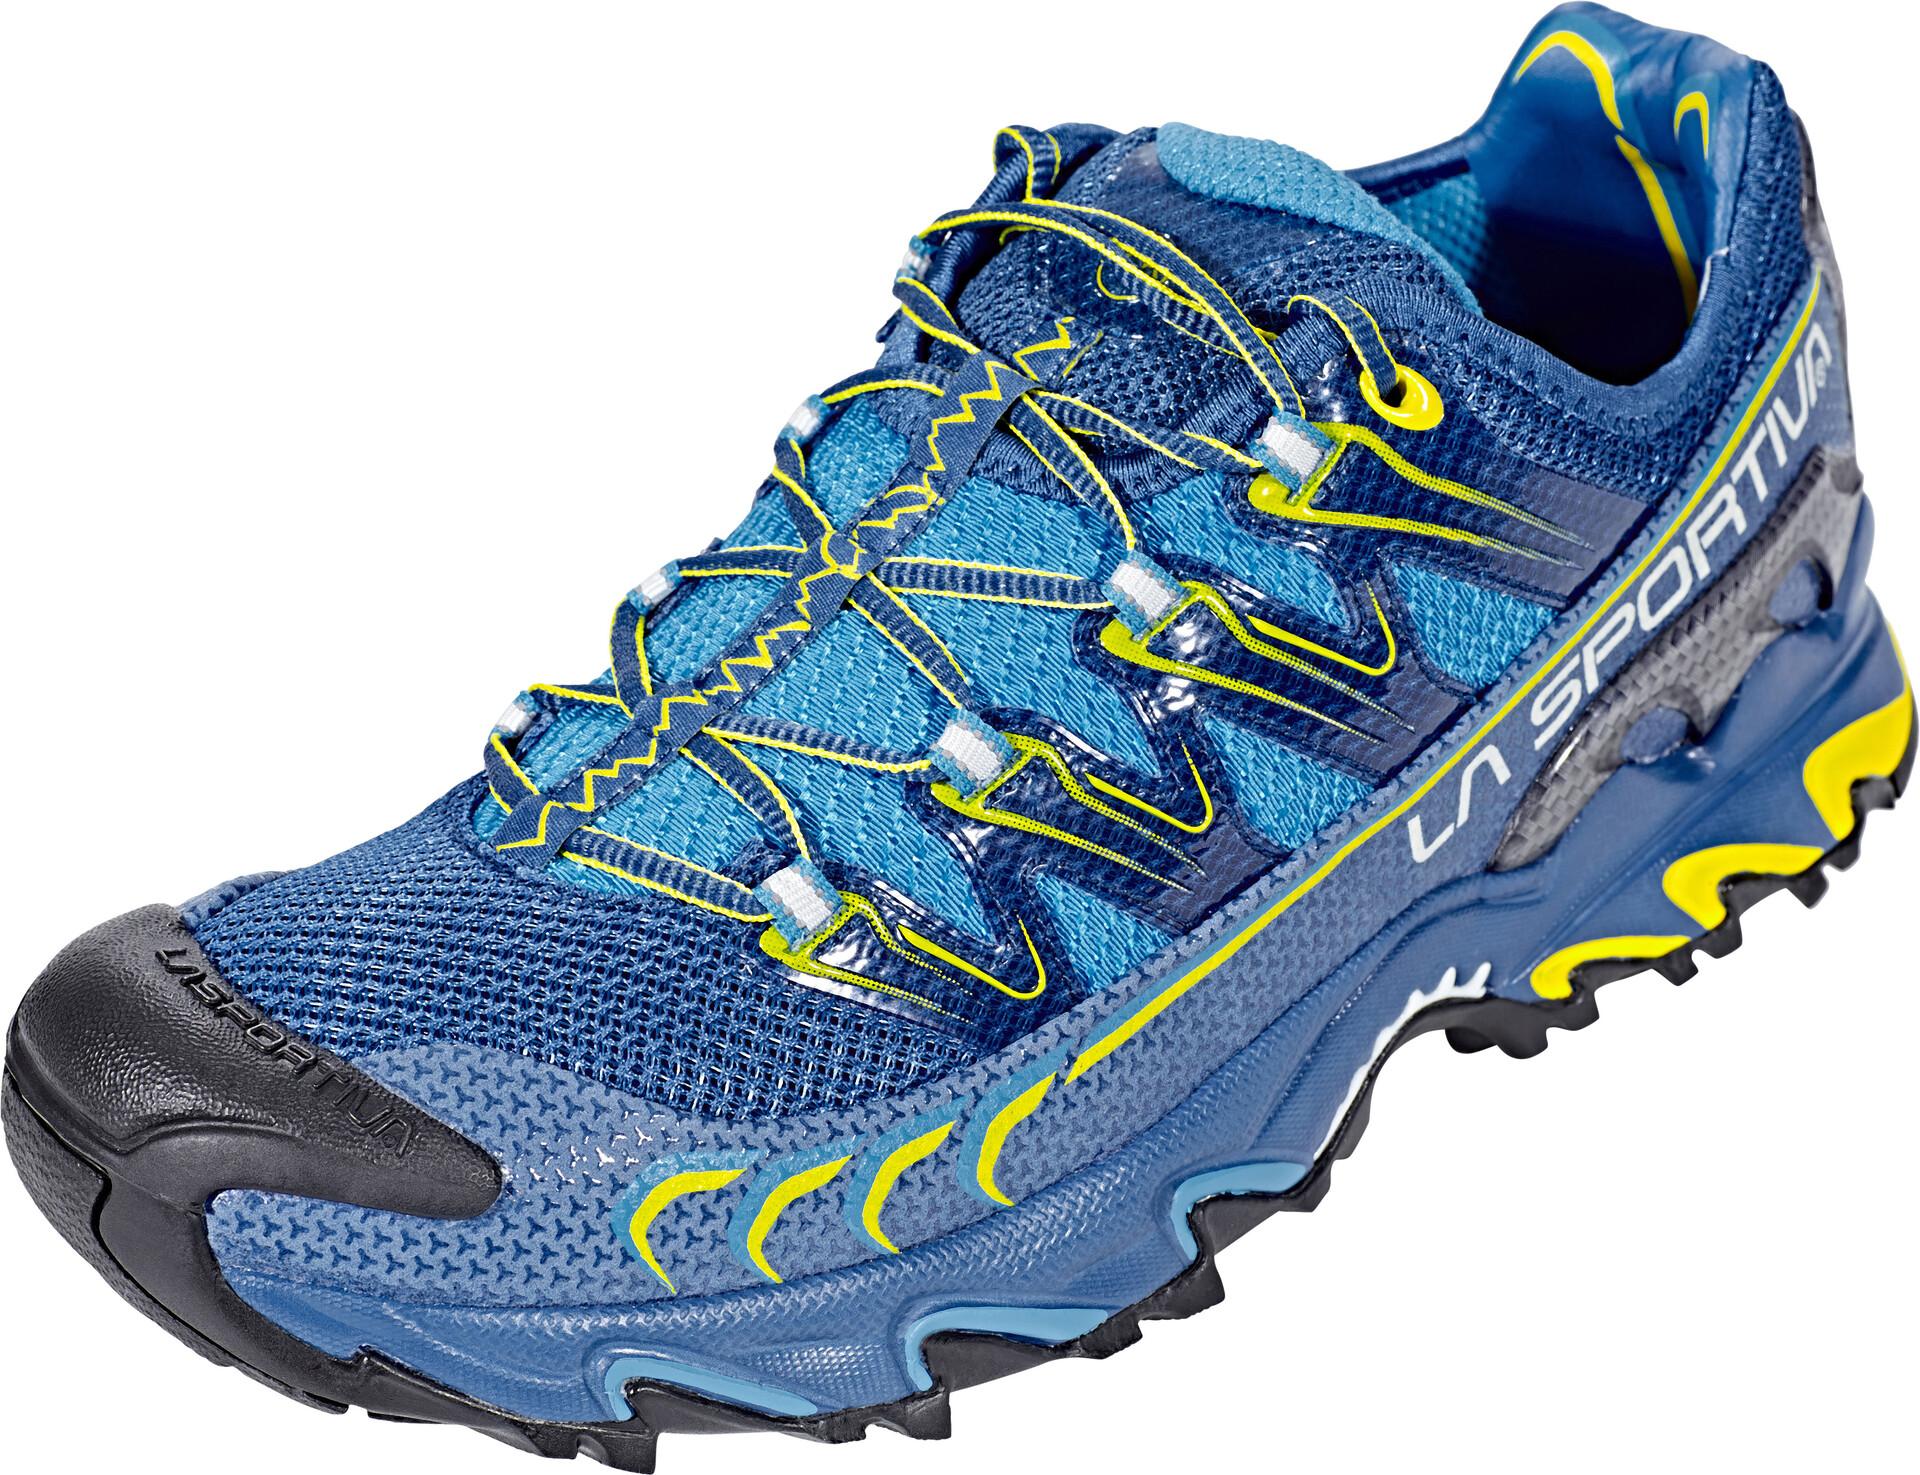 La Sportiva Trail Chaussures Raptor De Ultra HommeBluesulphur 354jRLAq